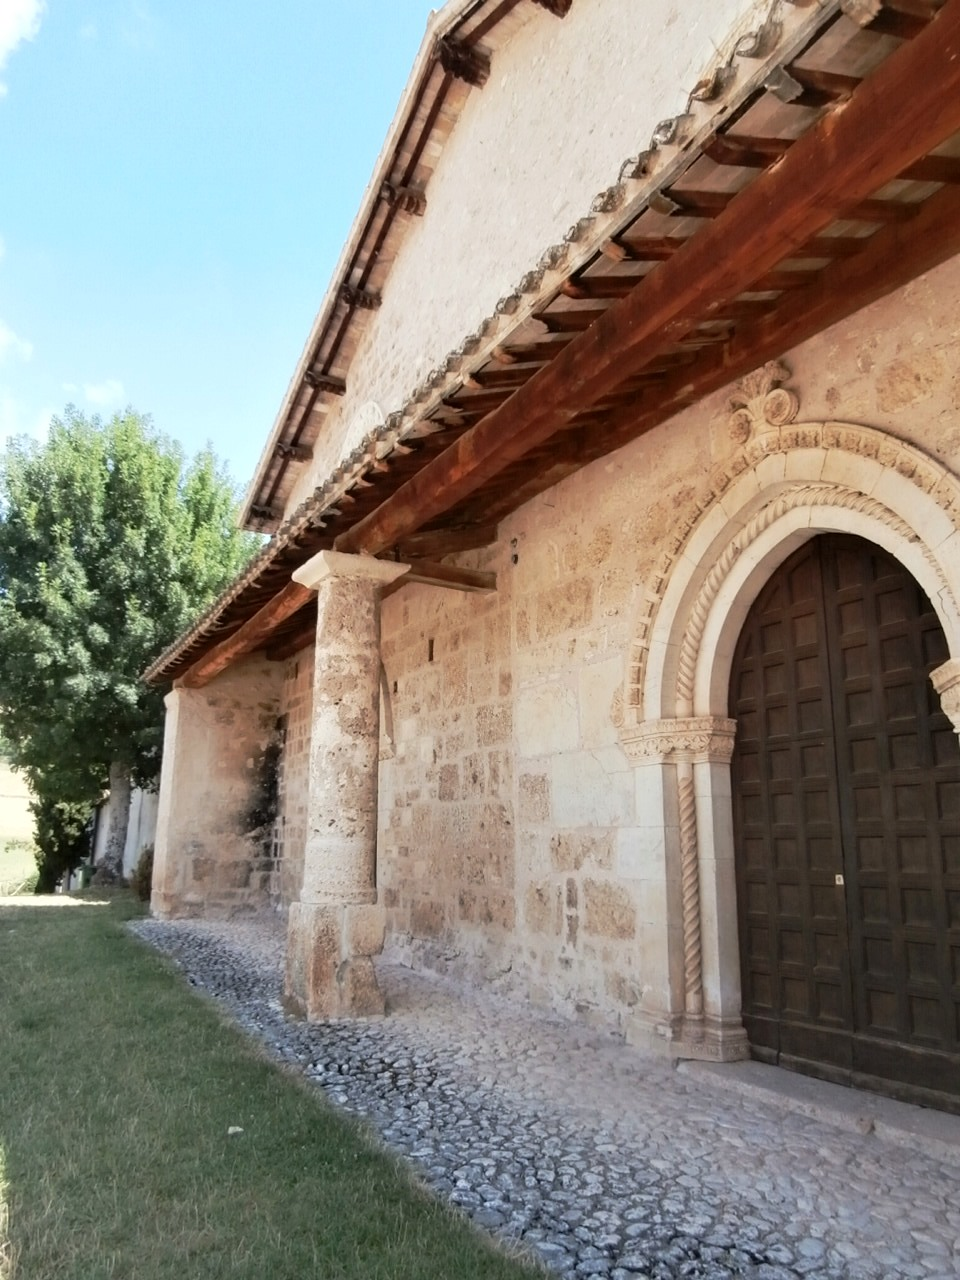 Campi, Norcia, chiesa San Salvatore, il portico (Foto UmbriaSud.com)